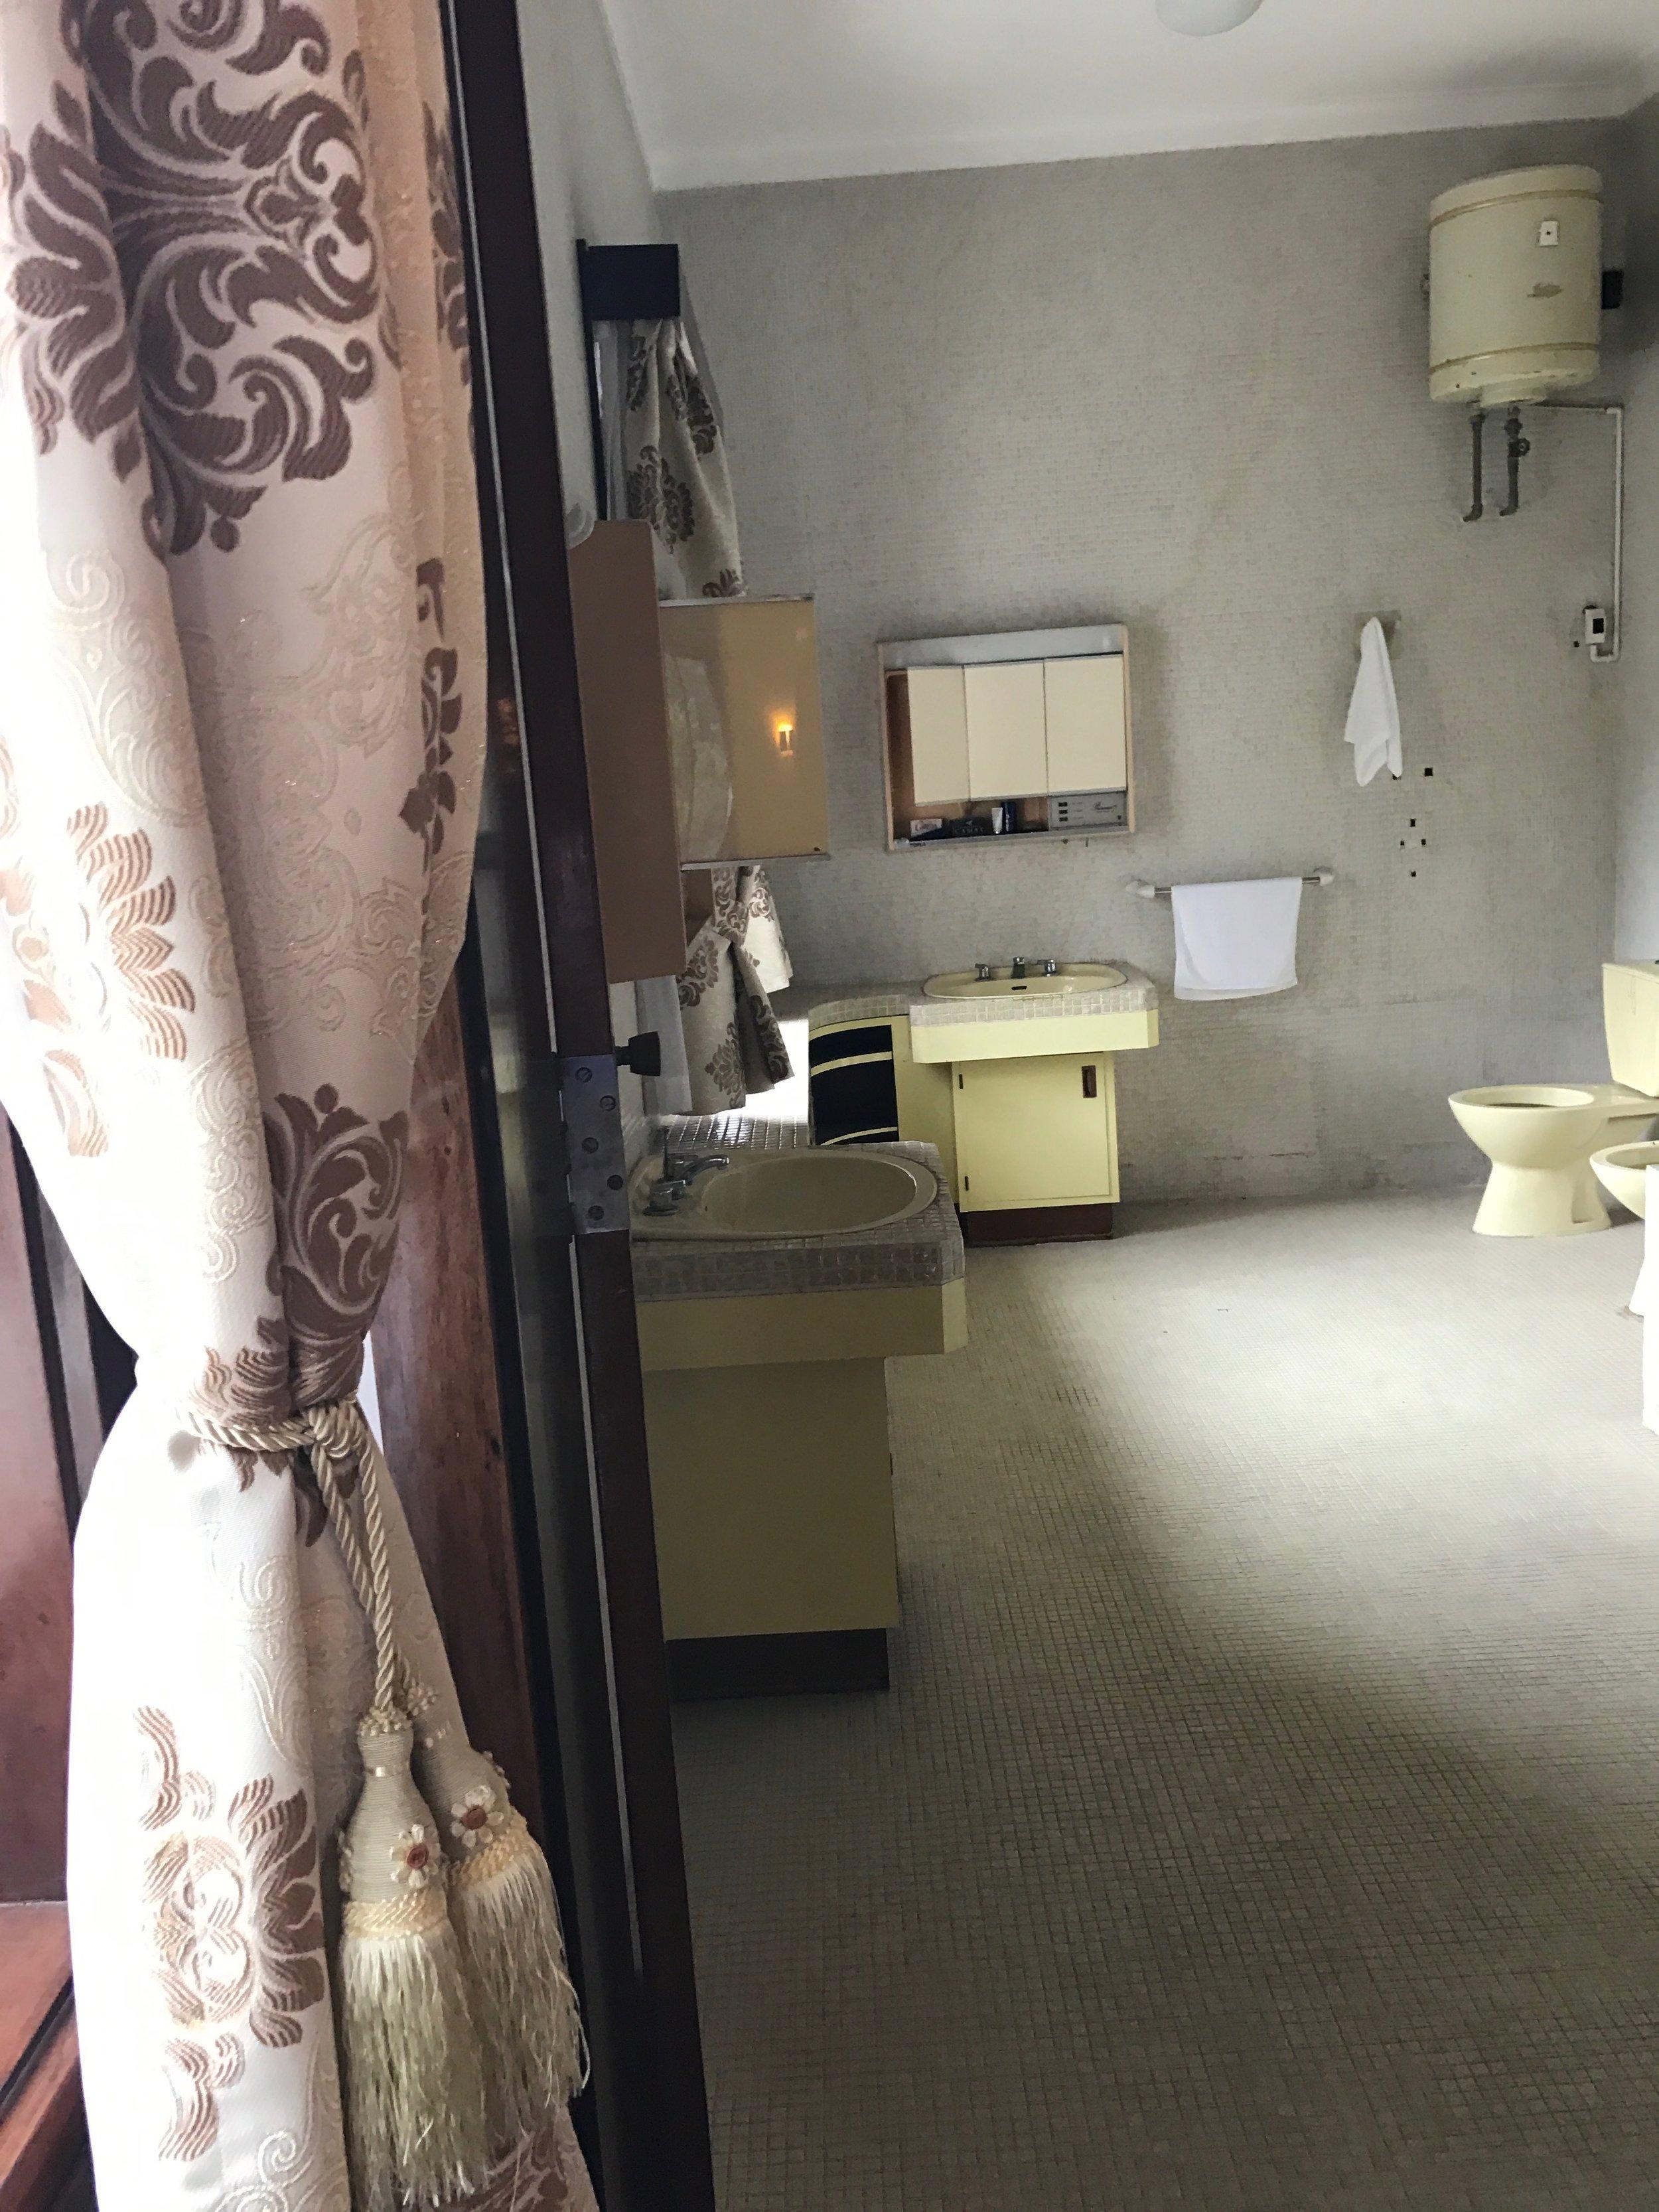 President's bathroom in private quarters